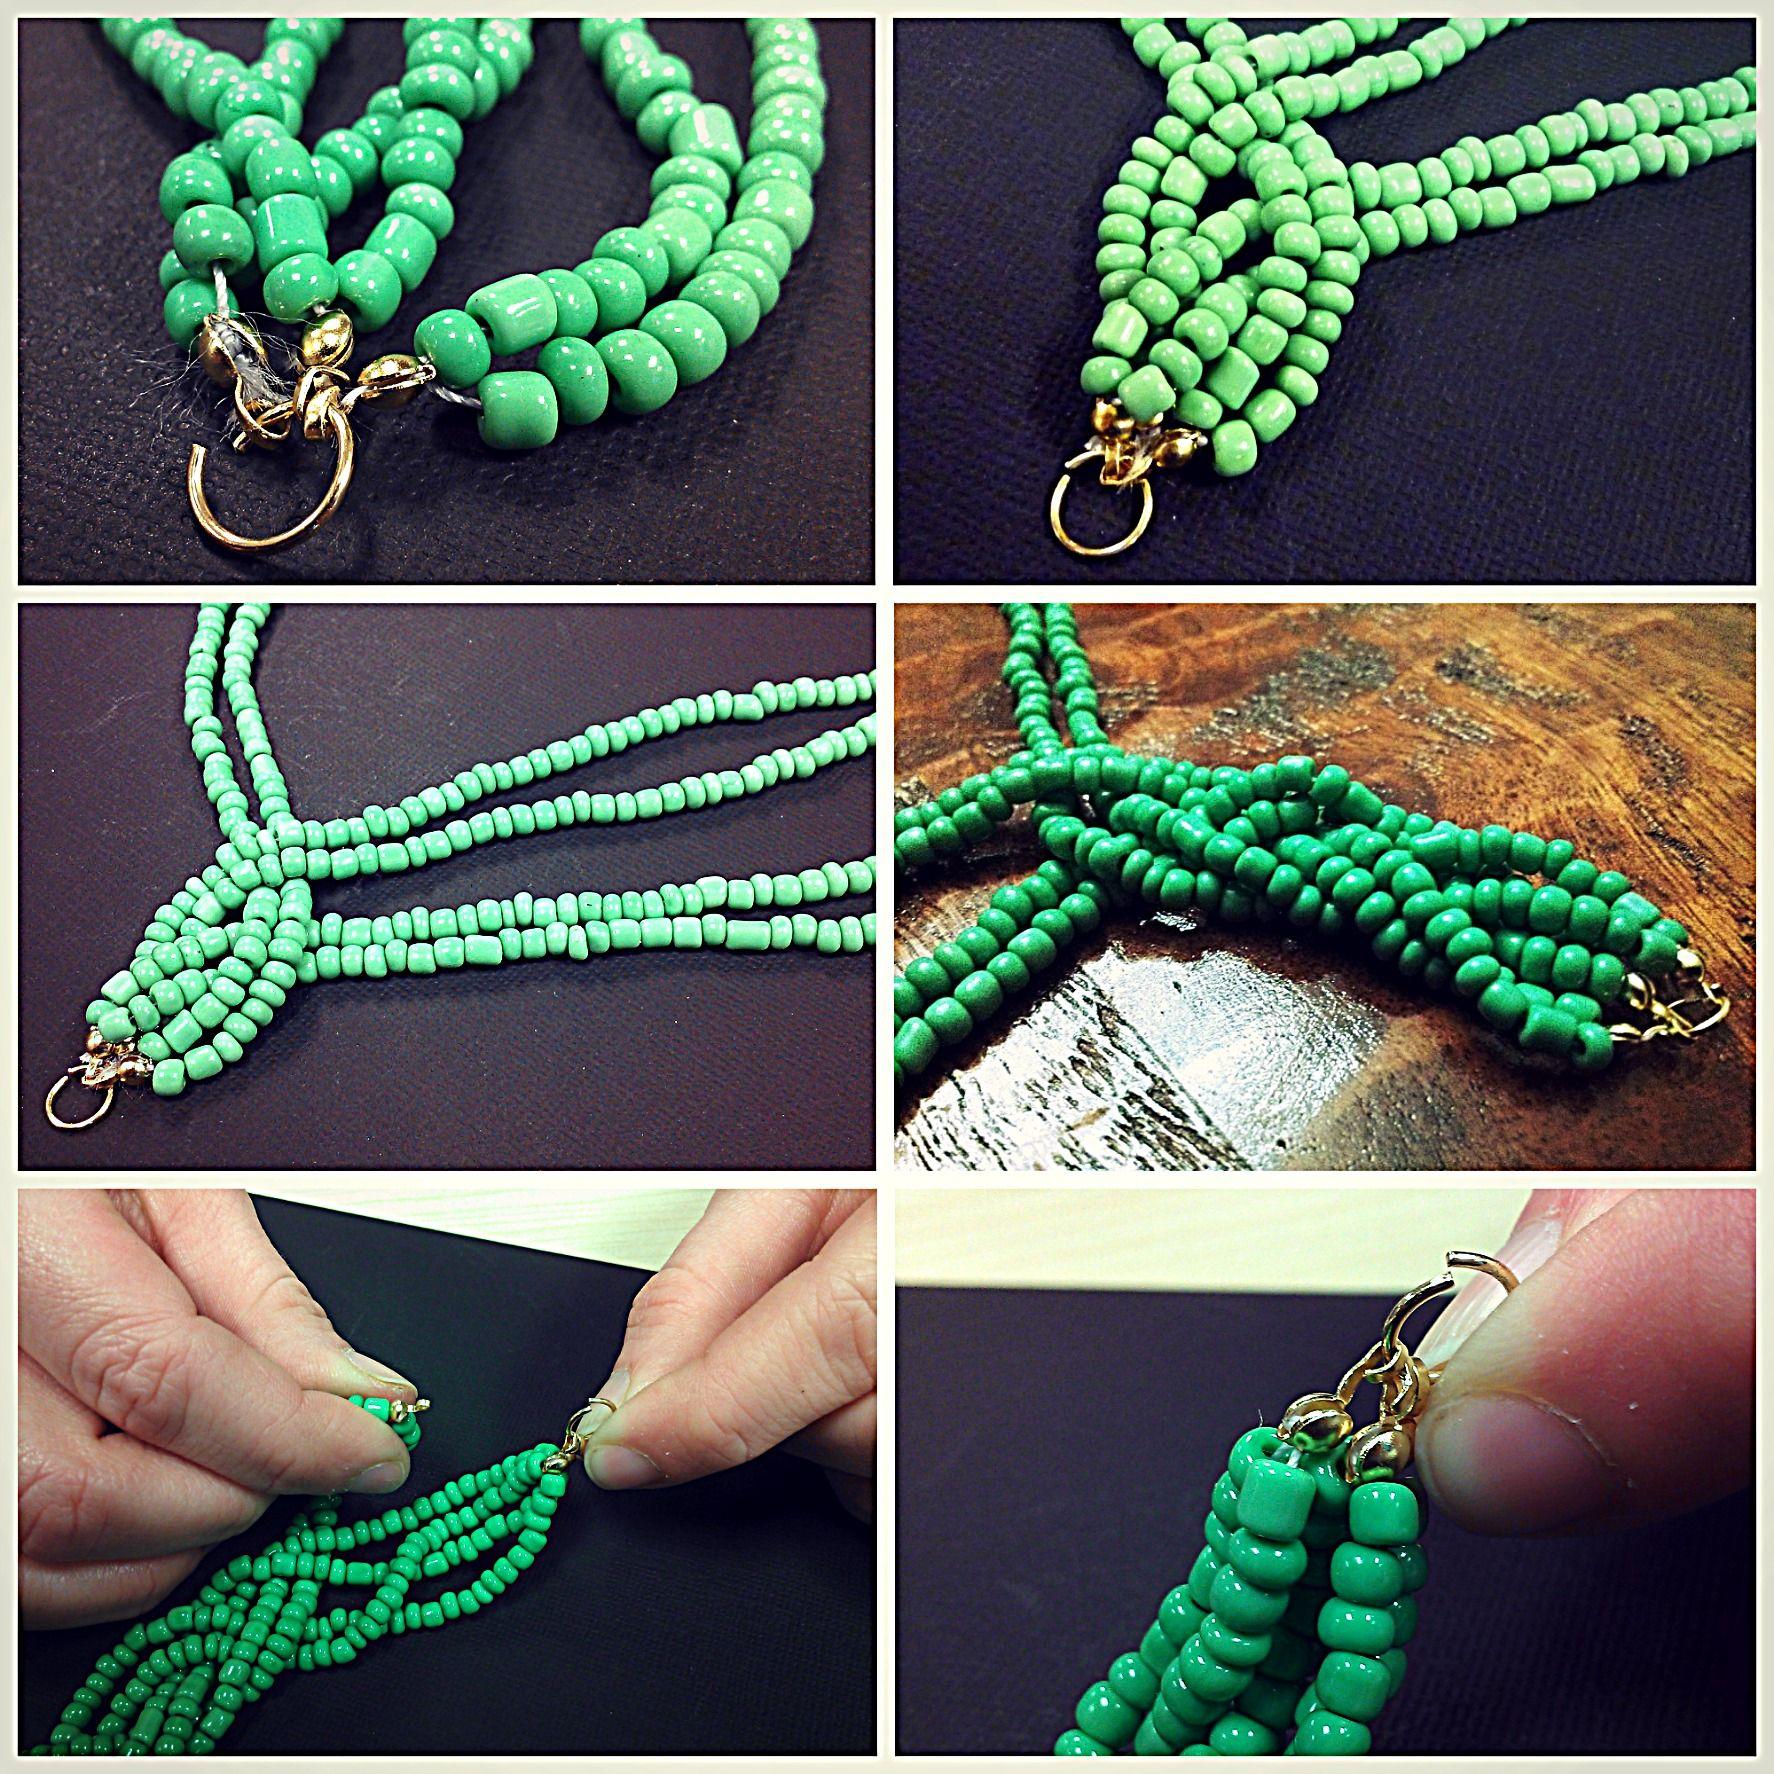 Bead Necklace Diy Braided Bead Strand Tutorial Beaded Jewelry Diy Beaded Necklace Patterns Beaded Necklace Diy